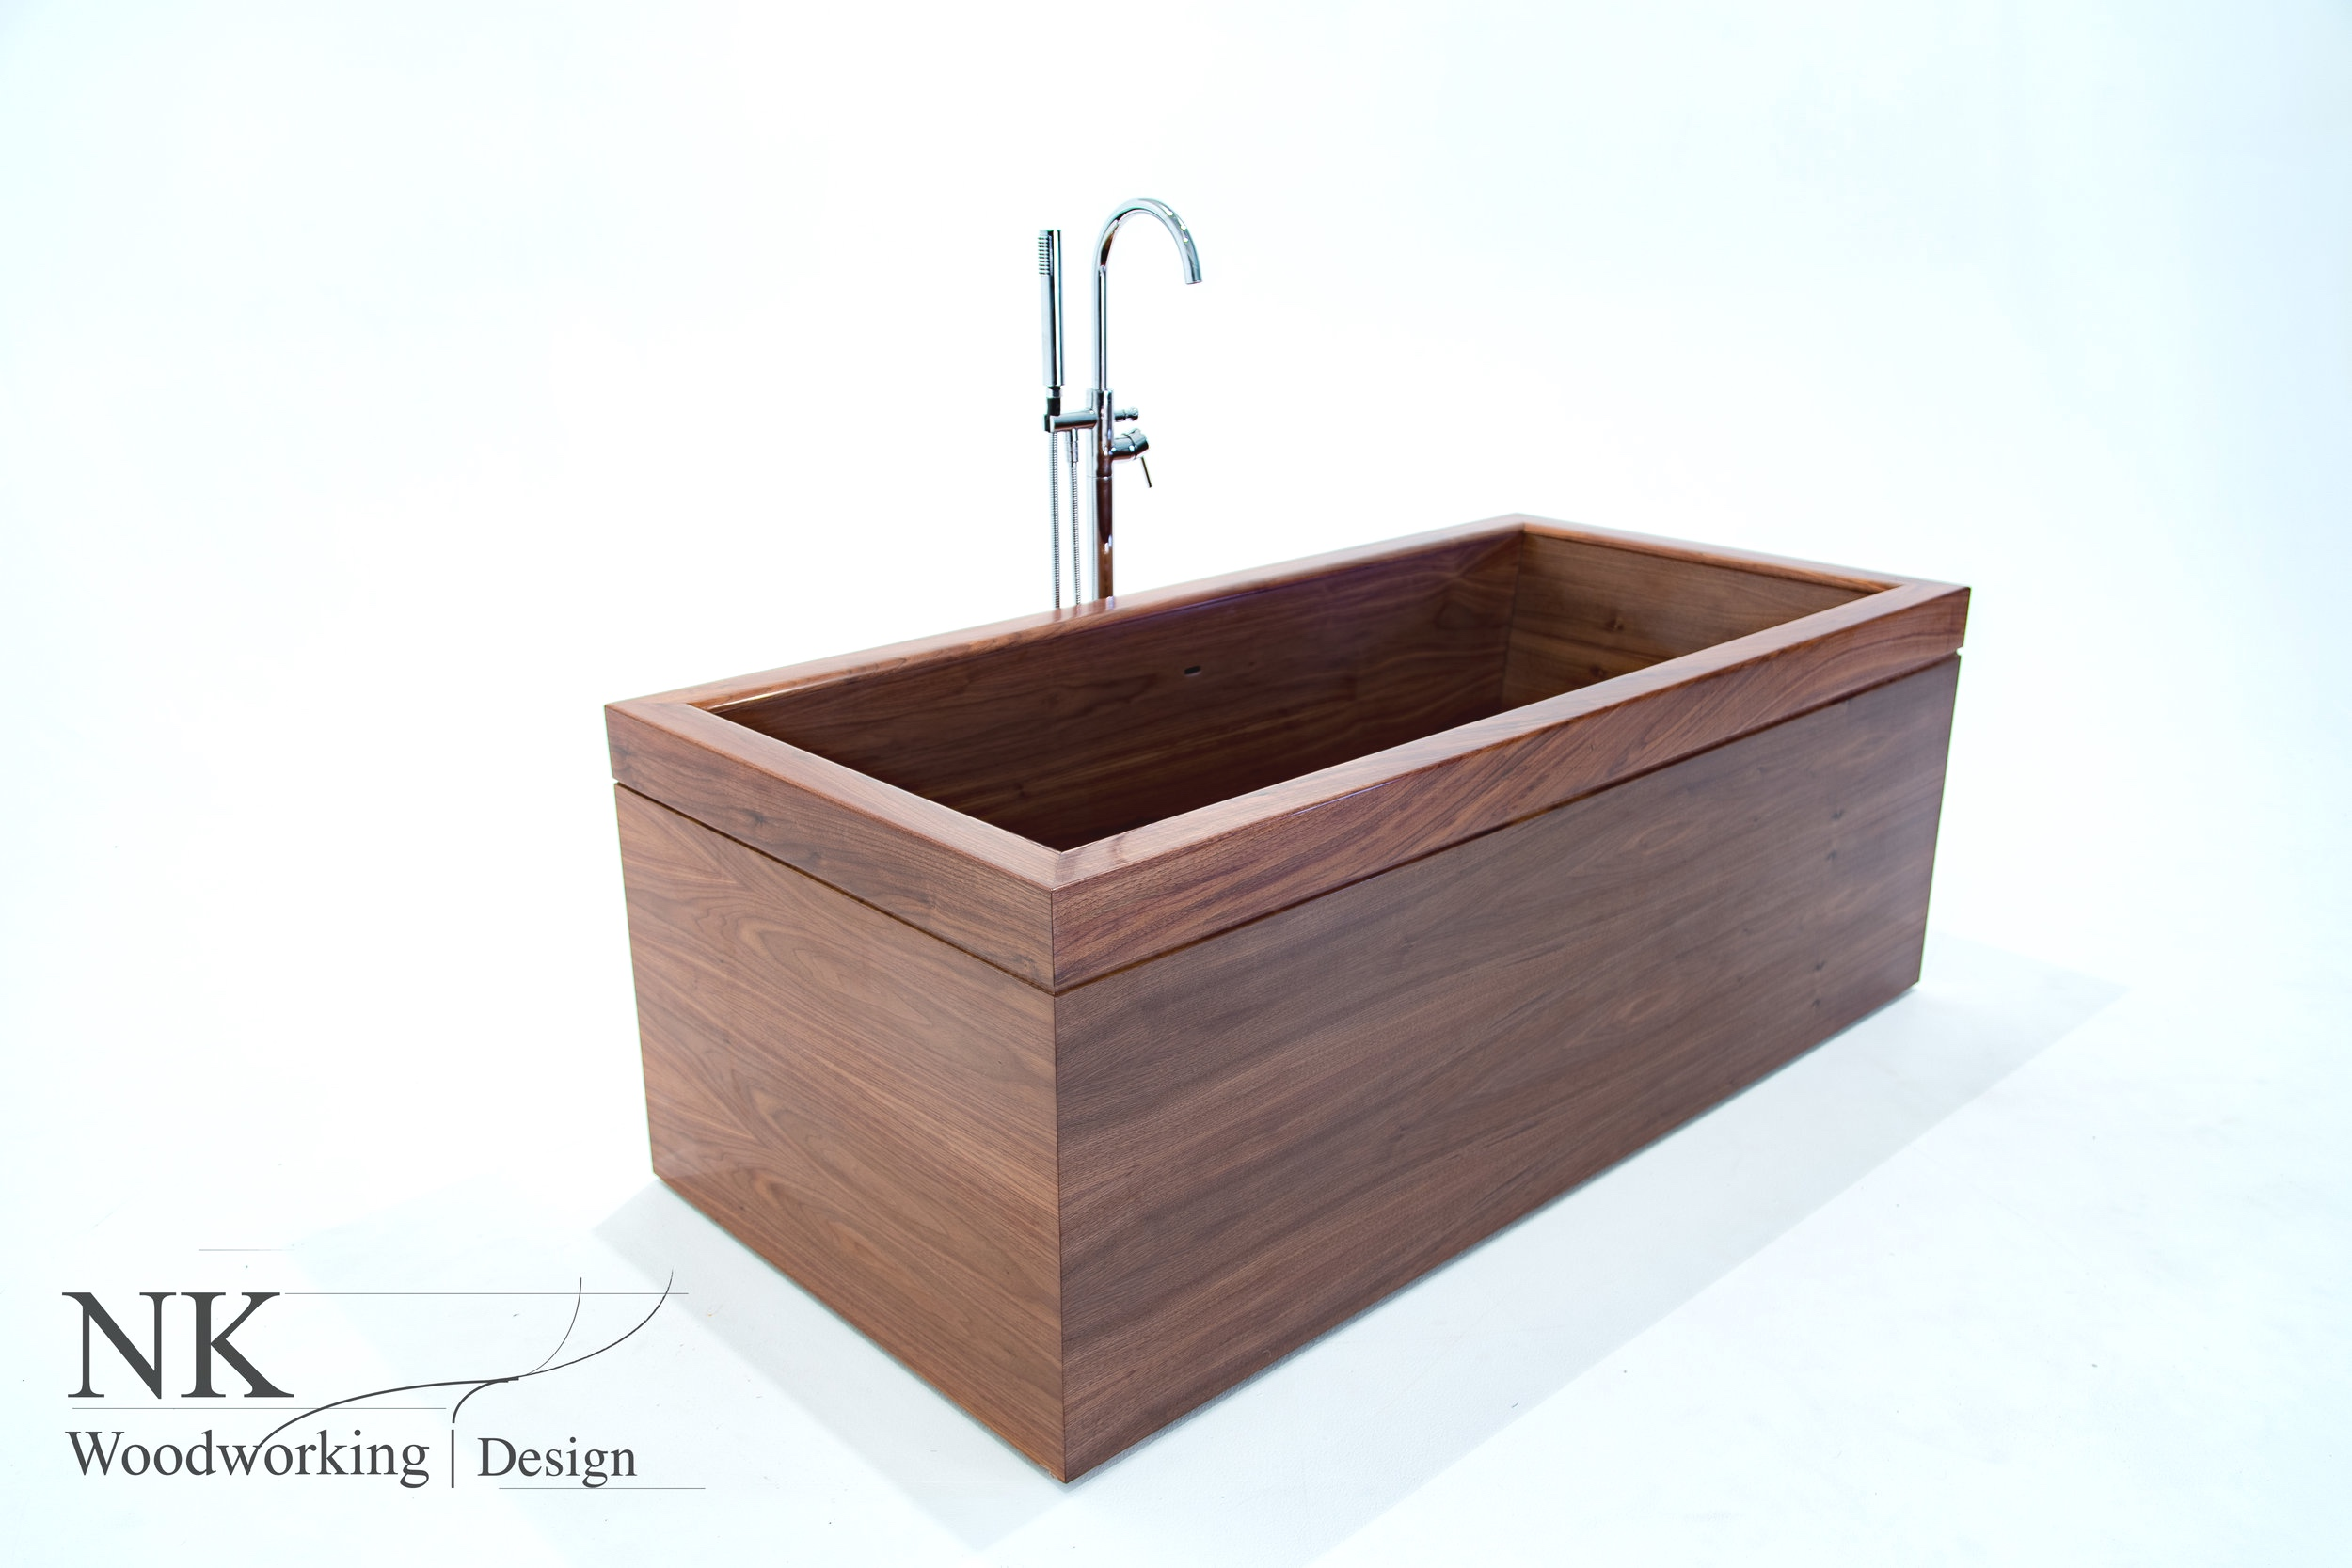 Wood Bathtubs Wooden Bath Sculpture By Nk Woodworking